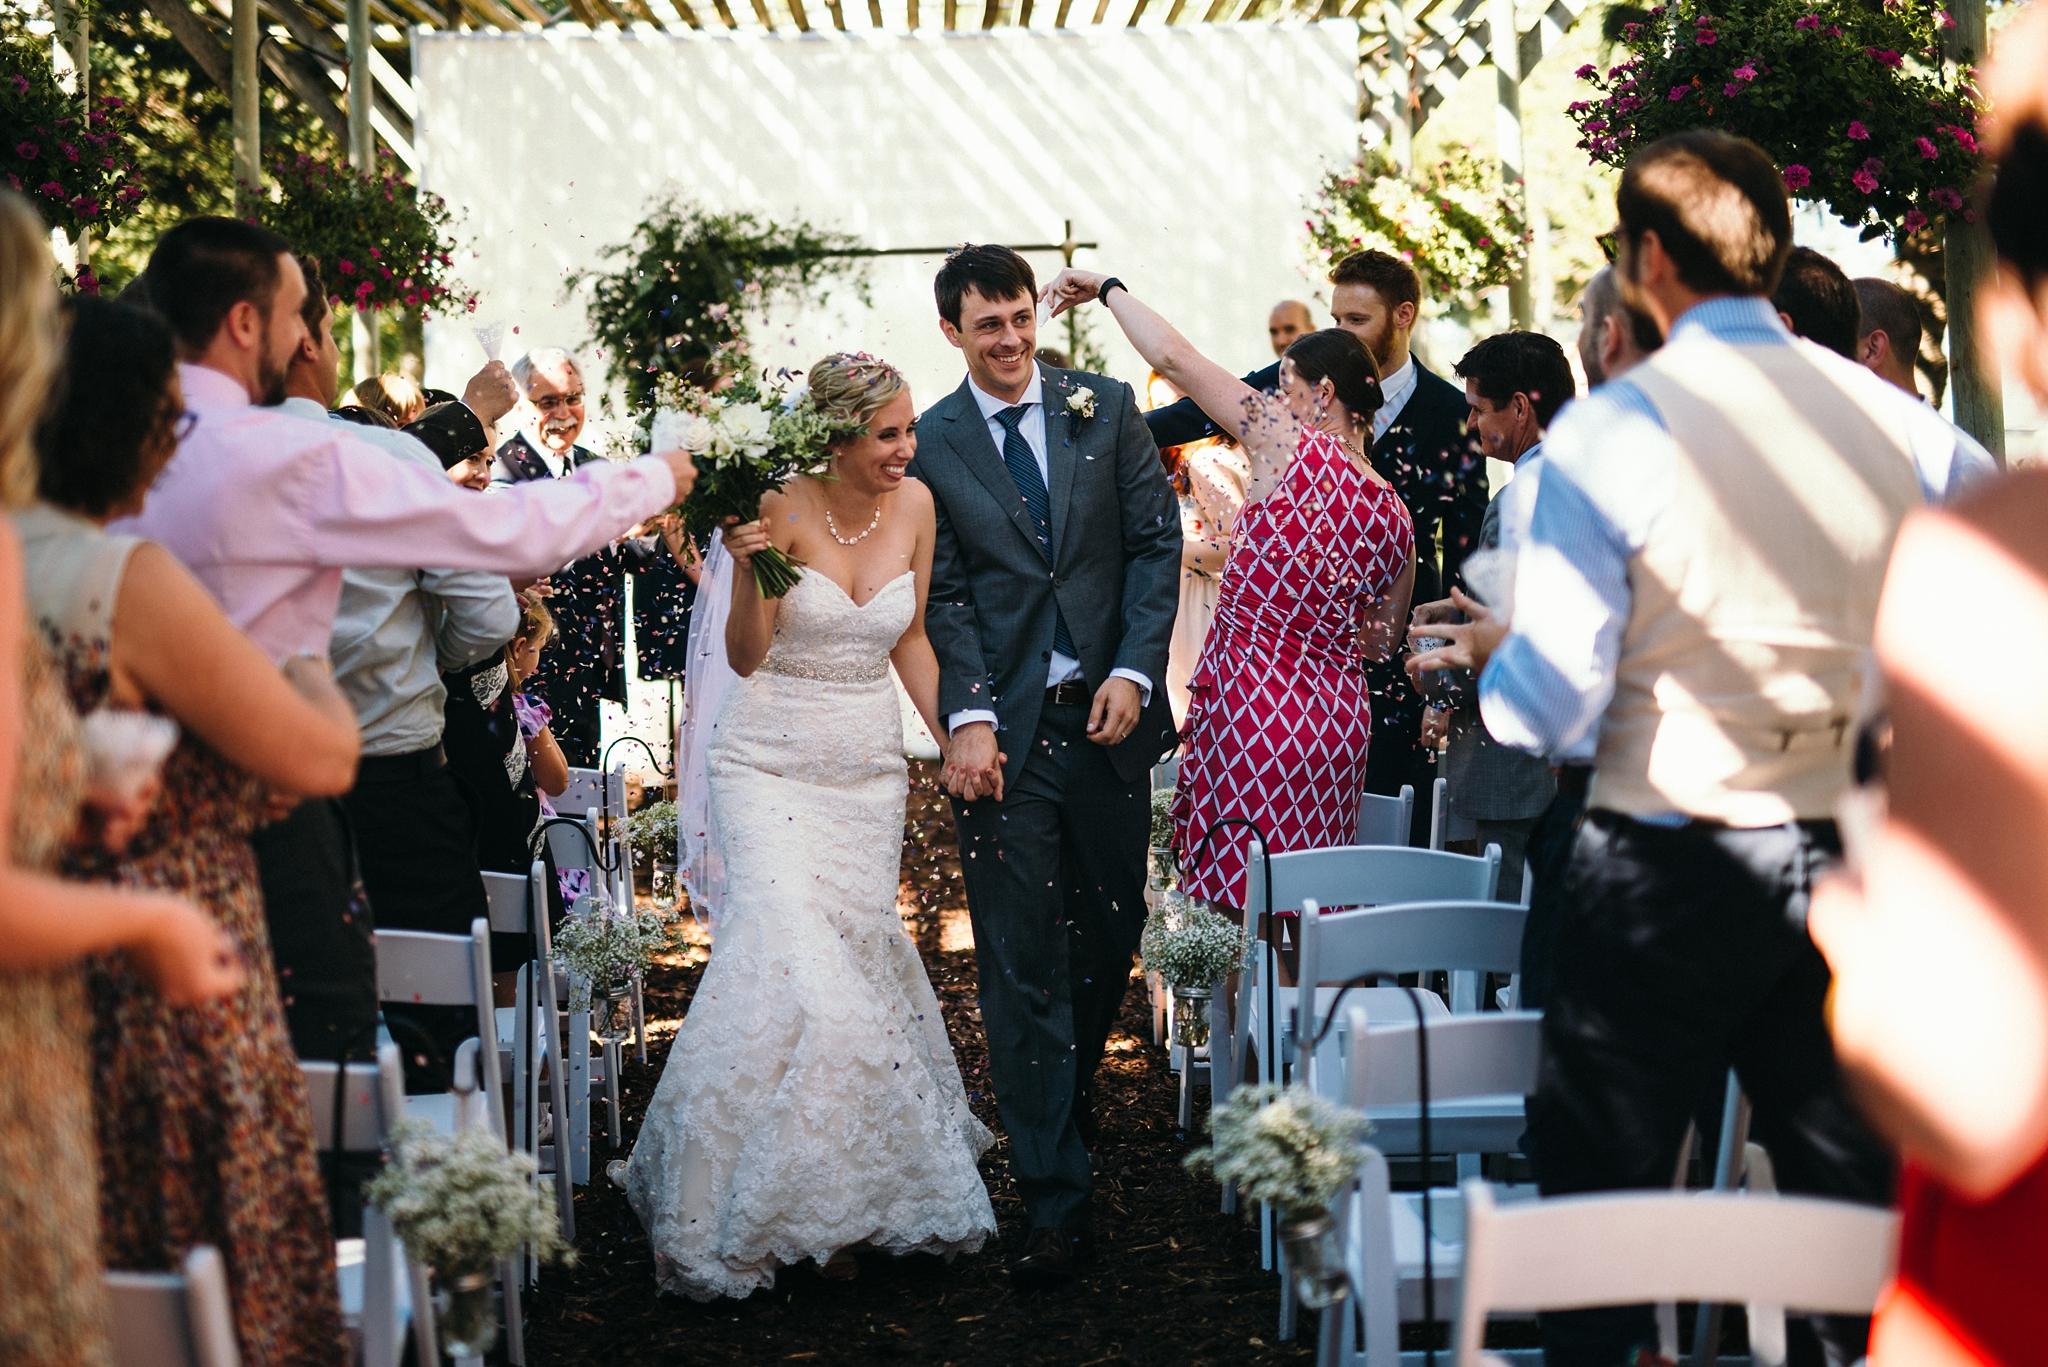 kaihla_tonai_intimate_wedding_elopement_photographer_4362